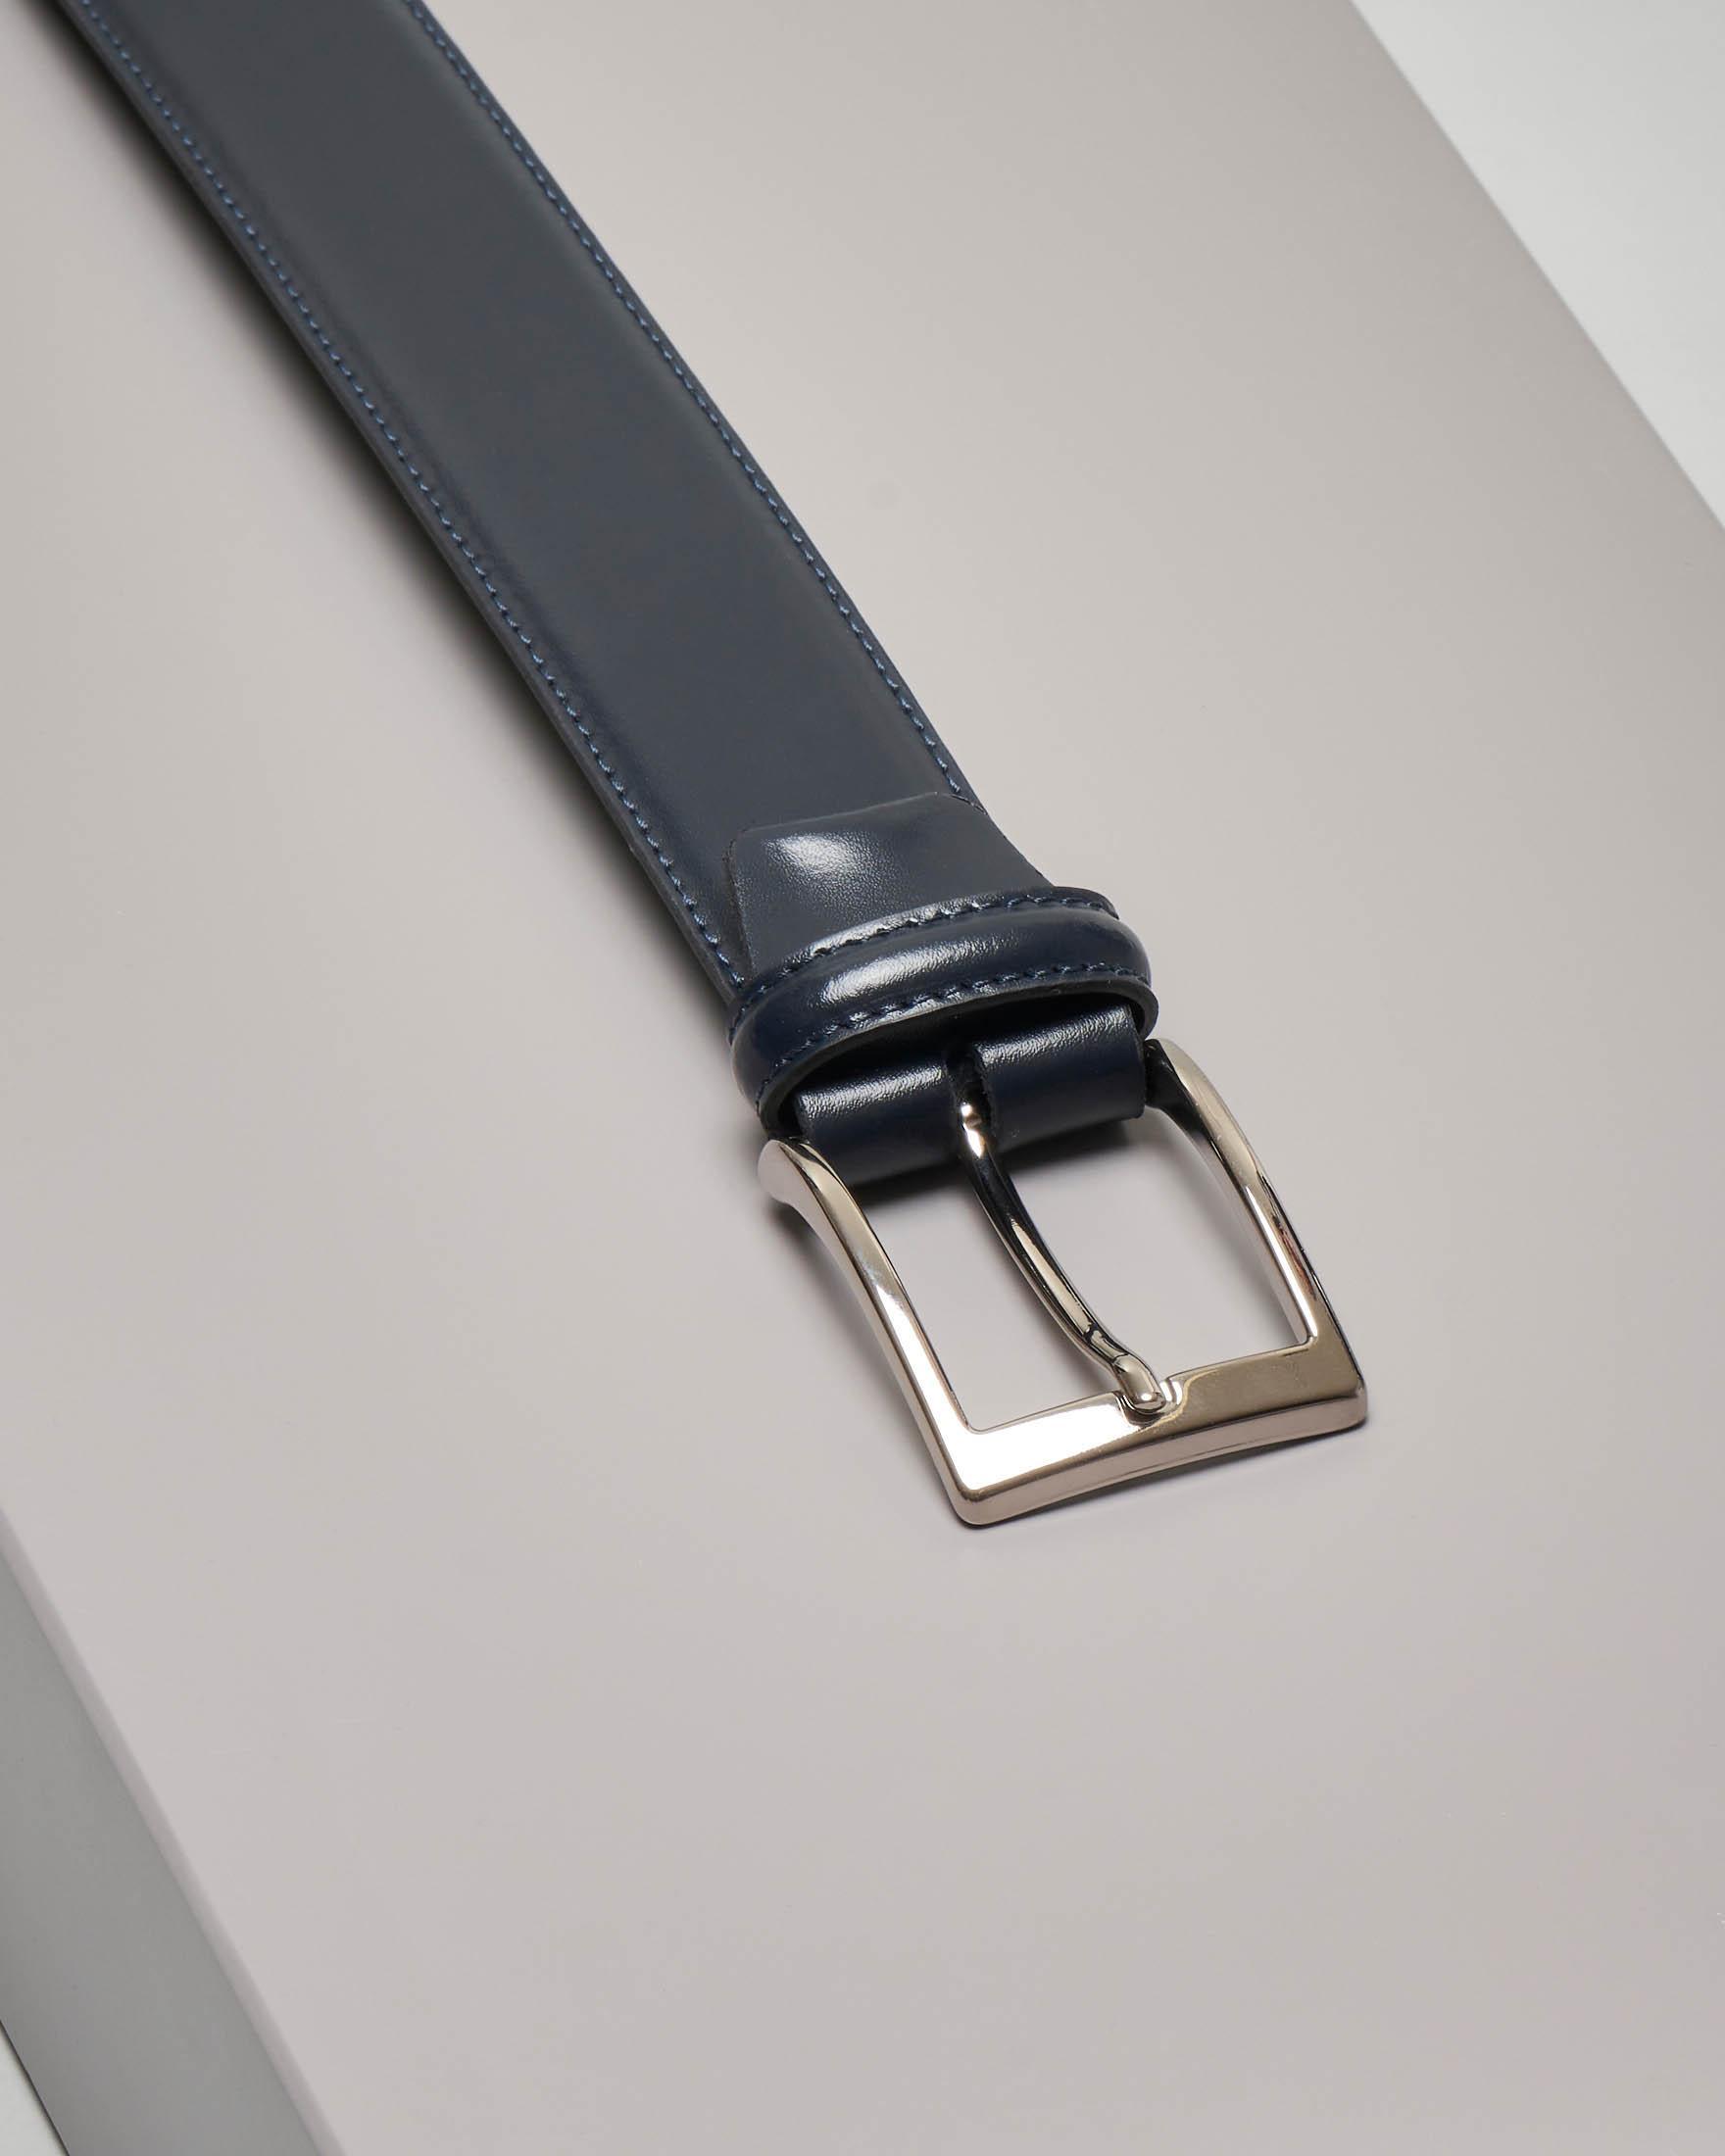 Cintura blu in pelle lucida con impunture a vista